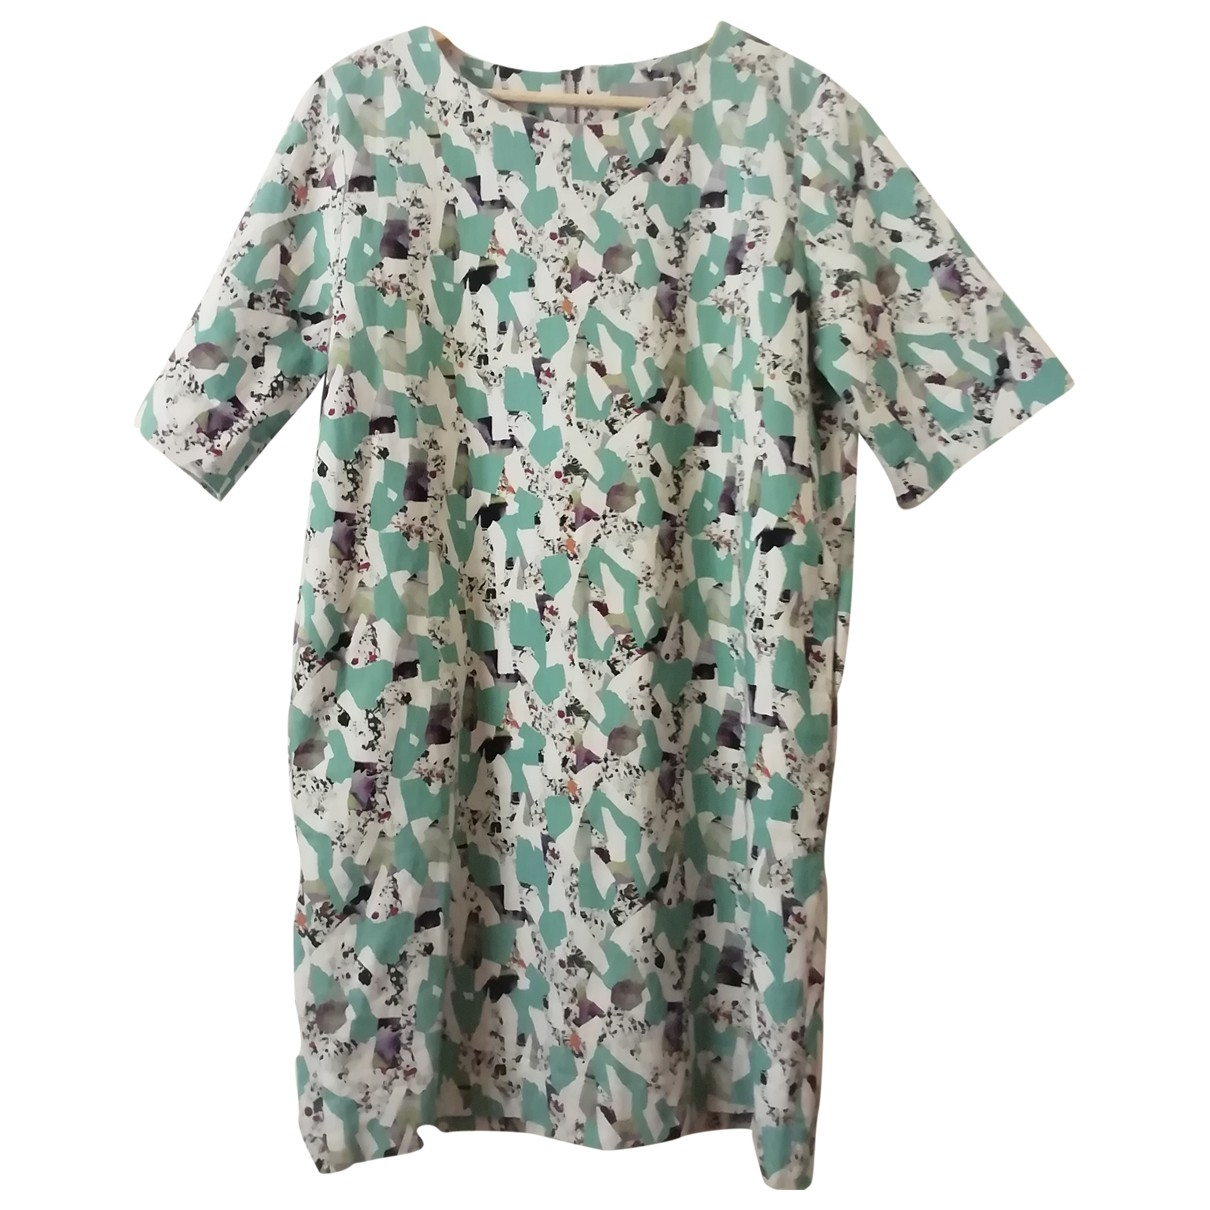 Cos - Robe   pour femme en coton - elasthane - multicolore